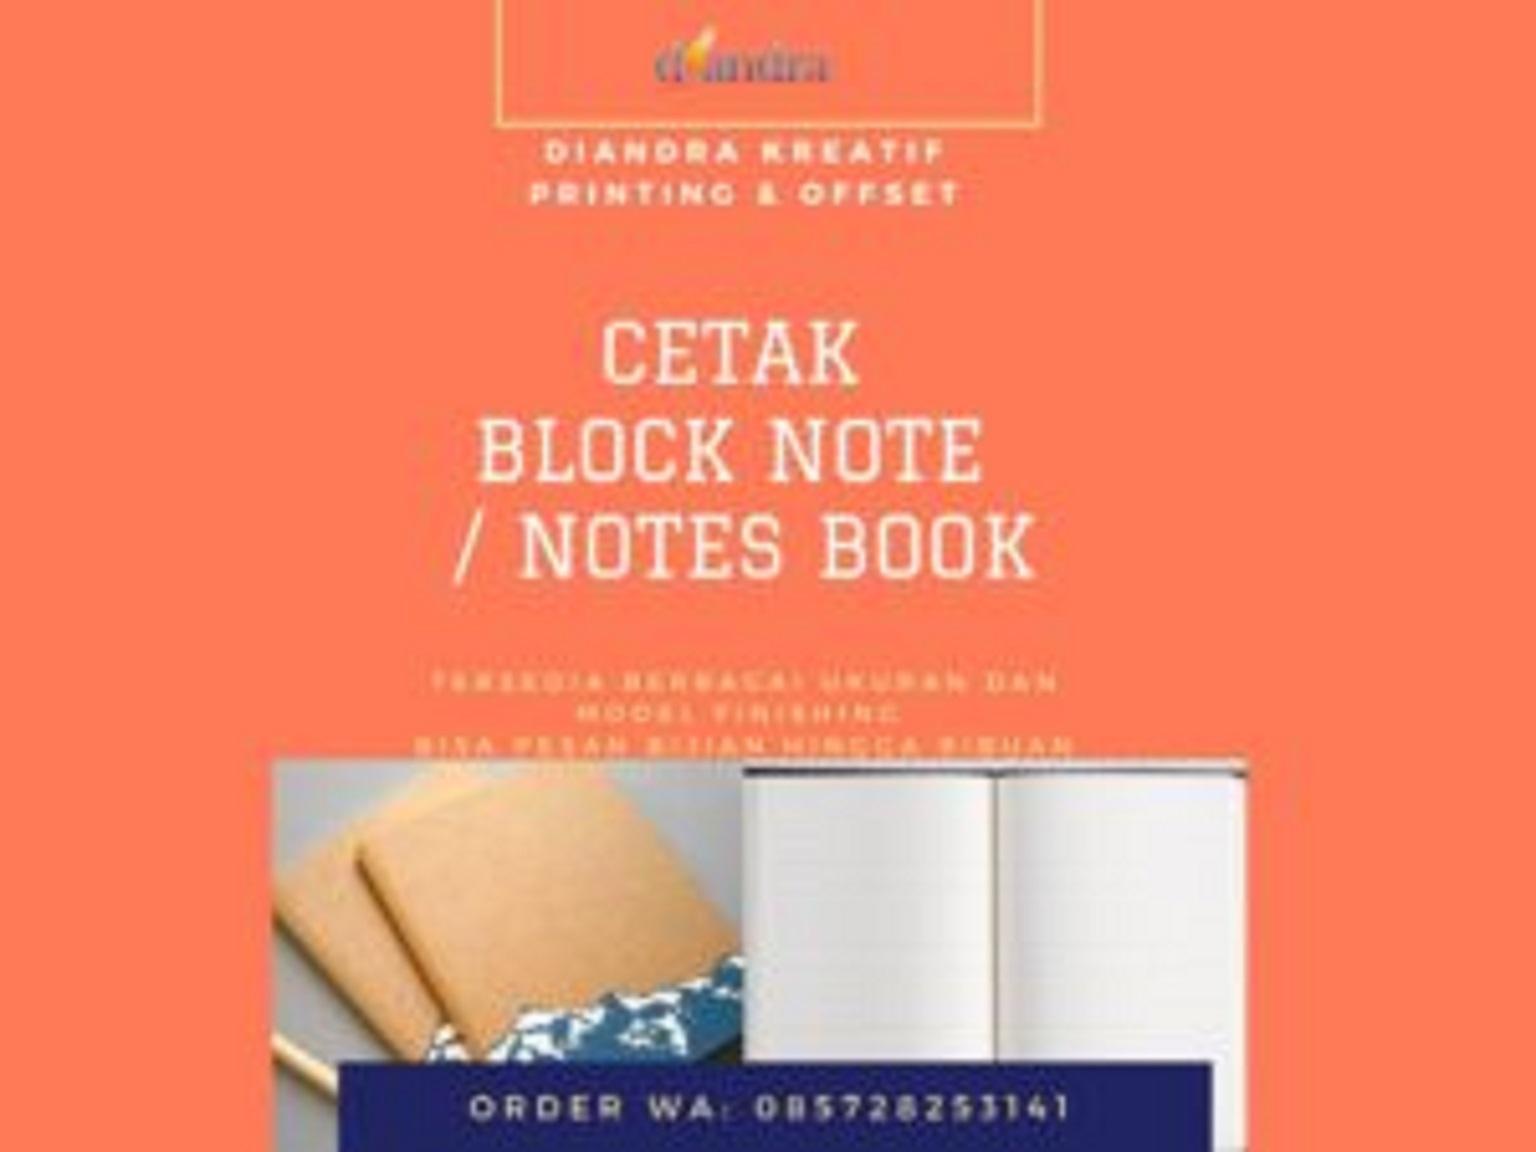 Cetak Block Note